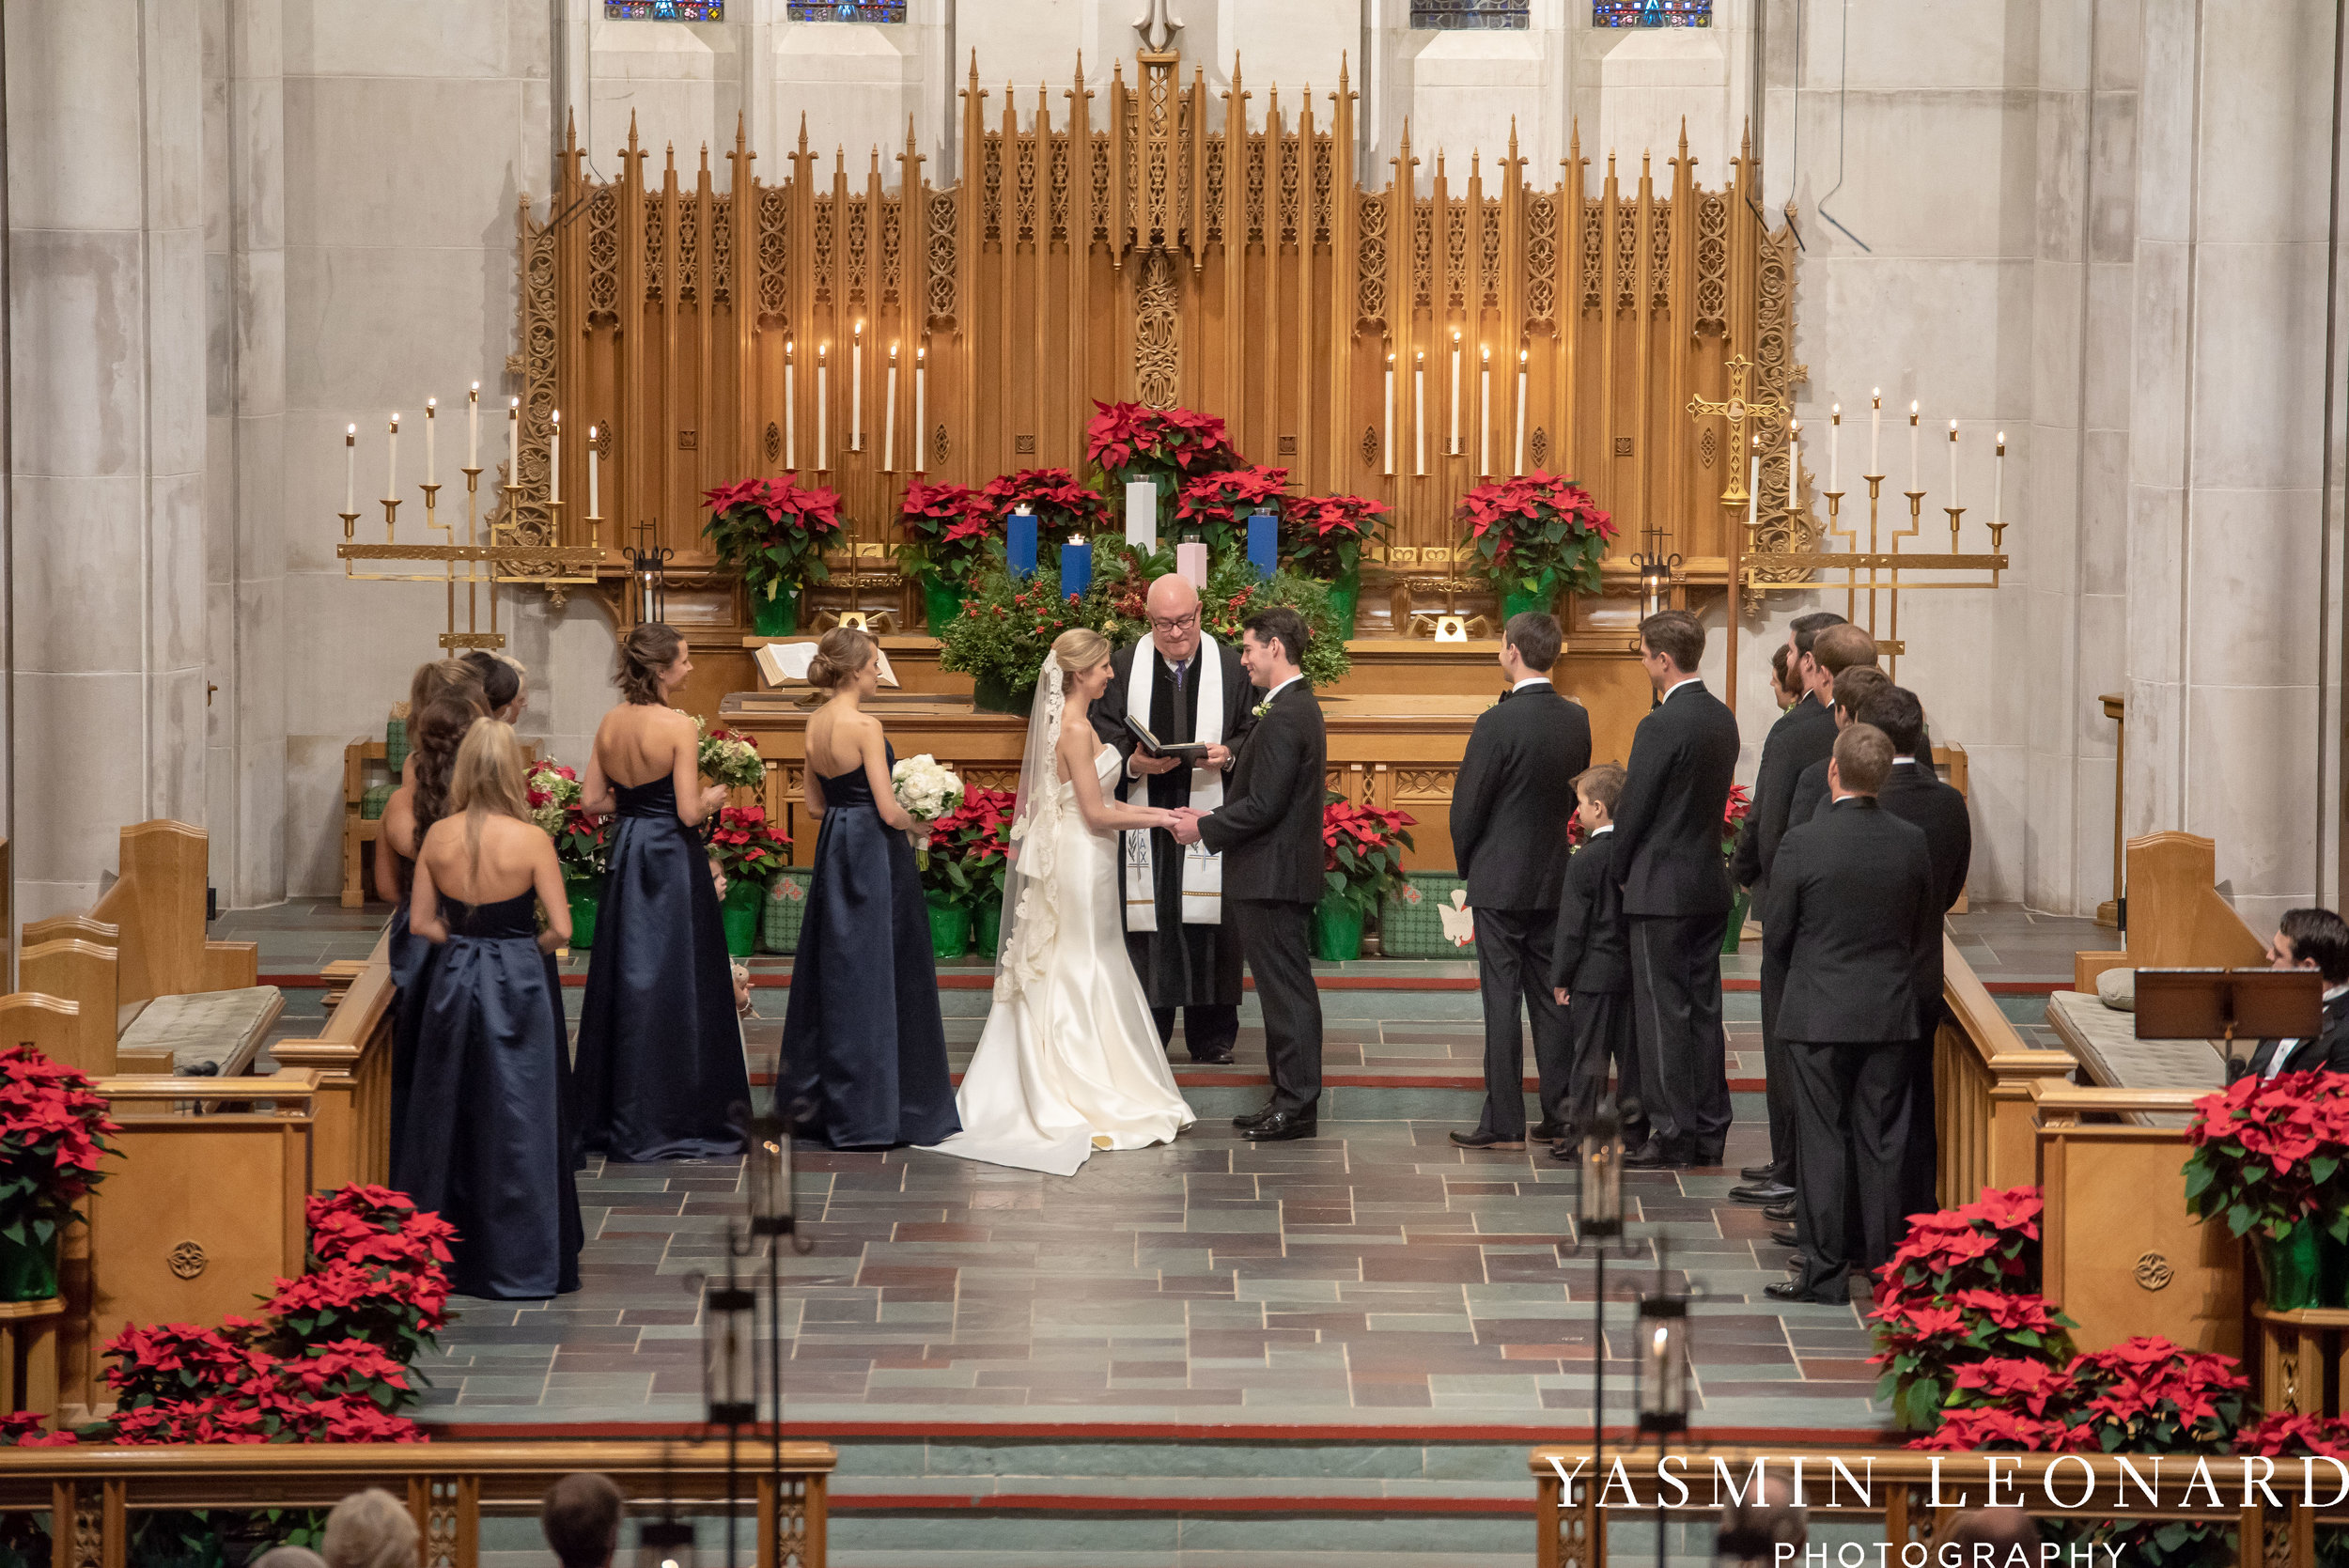 Wesley Memorial UMC - High Point Country Club - Emerywood Country Club - High Point Weddings - High Point Wedding Photographer - Yasmin Leonard Photography-16.jpg